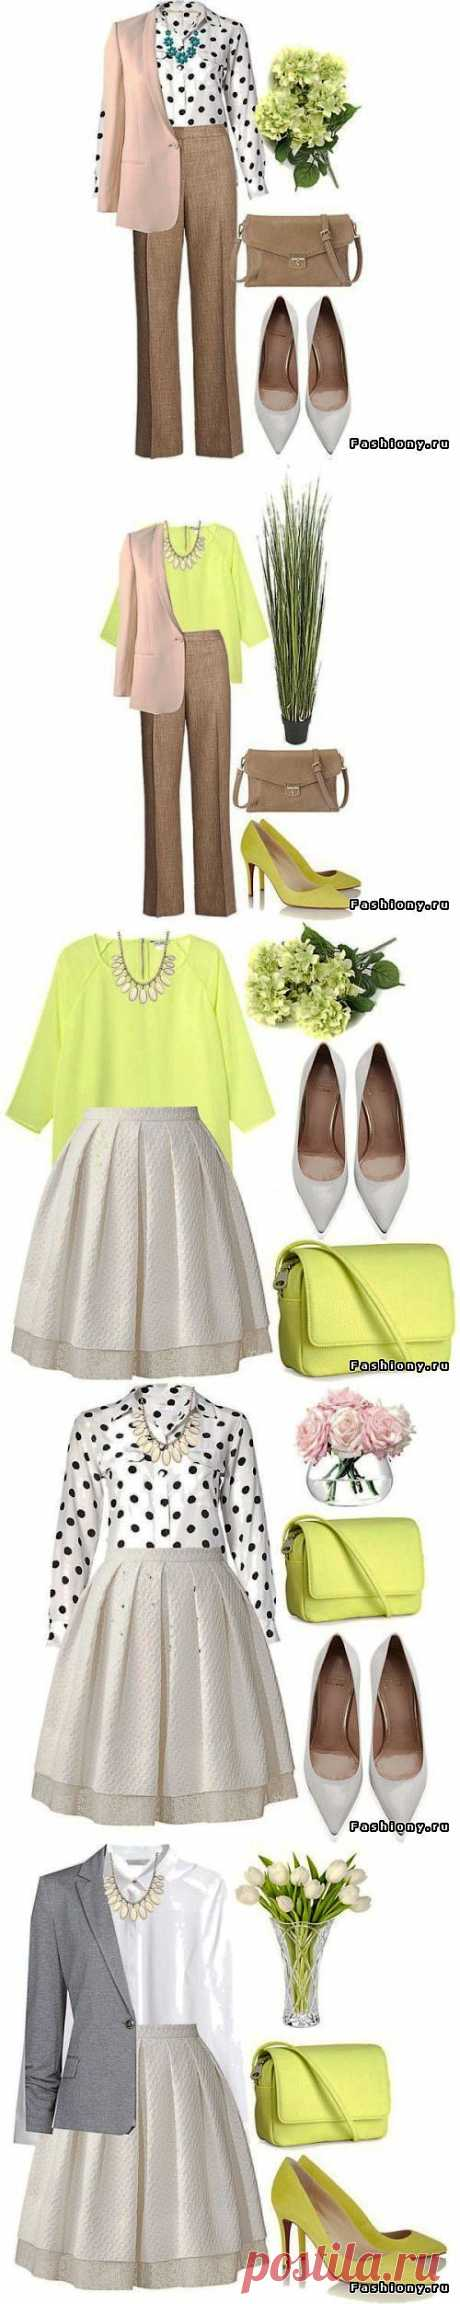 (+1) тема - Базовый гардероб на весну | Мода